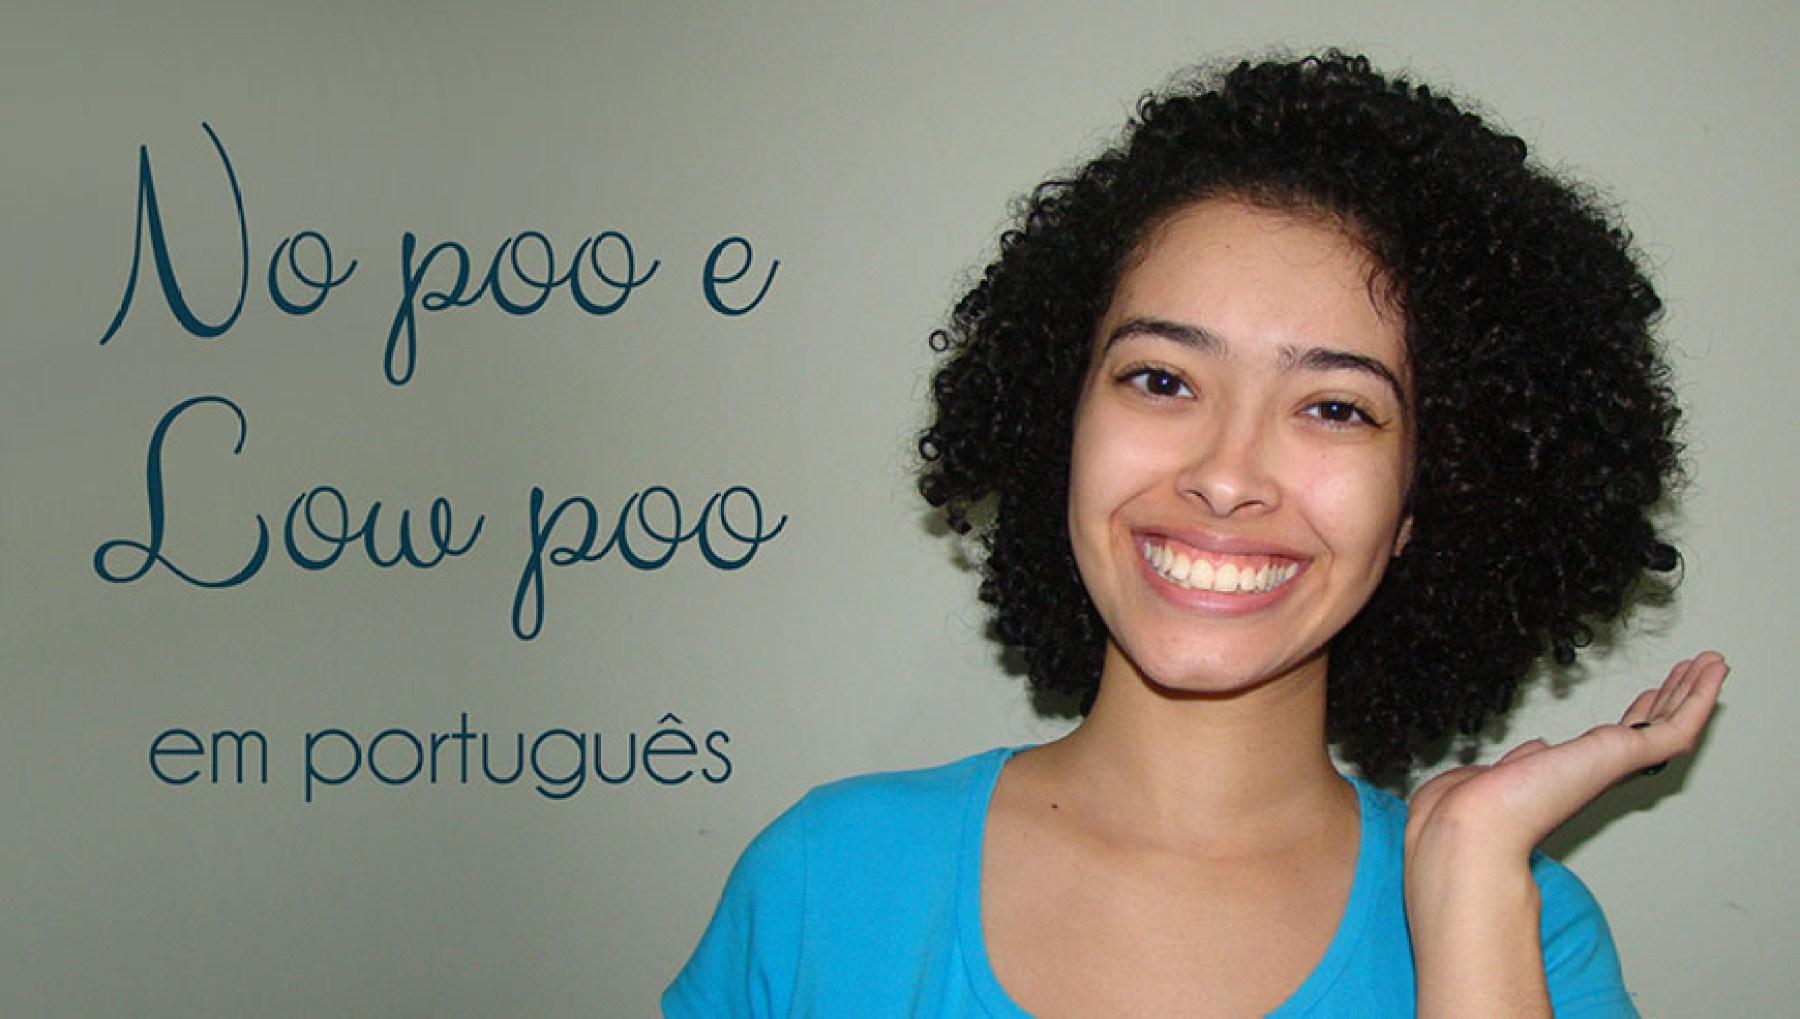 no-poo-low-poo-portugues-traducao